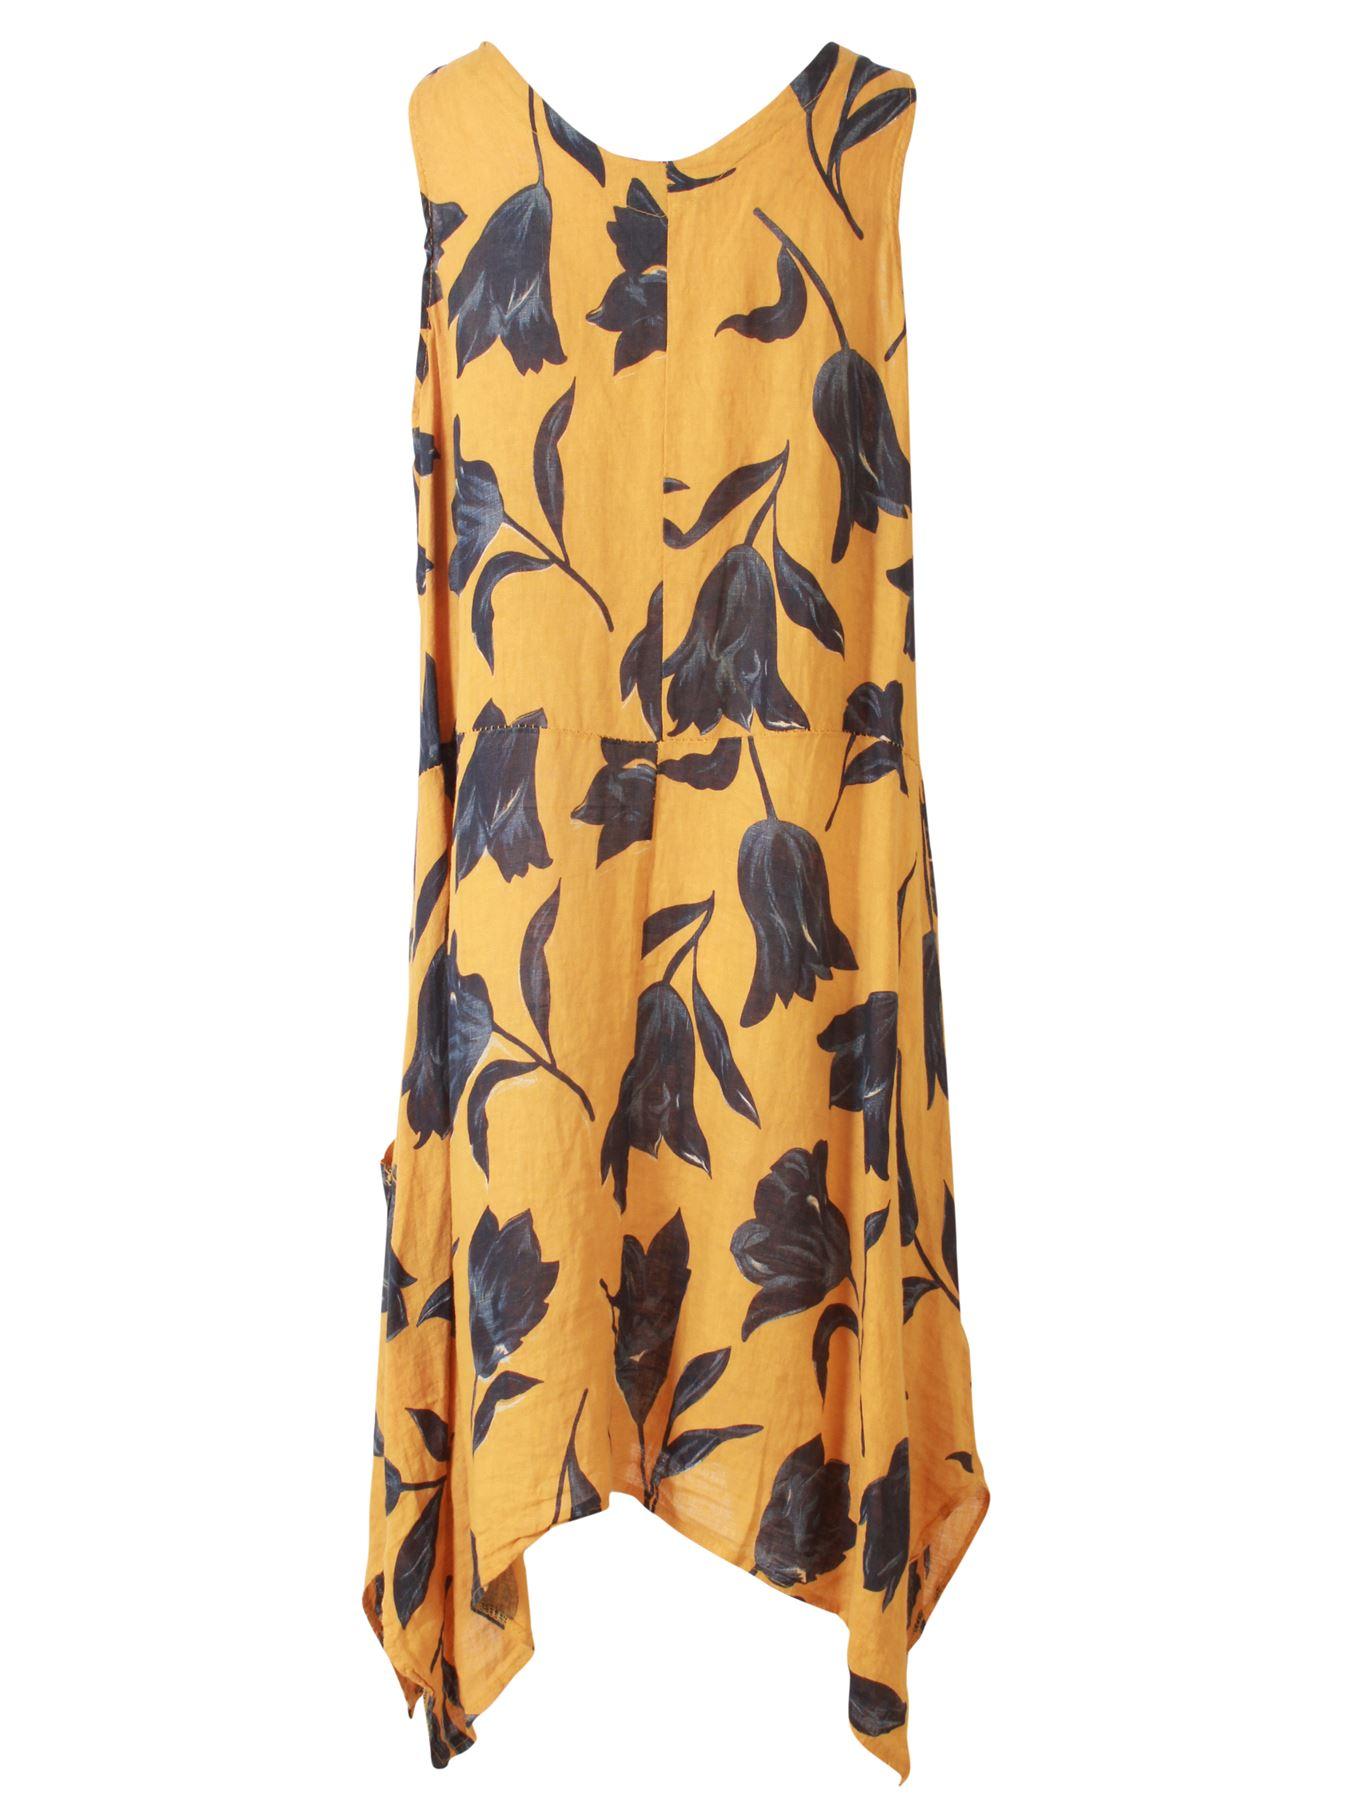 Womens-Tulip-Floral-Print-Italian-Lagenlook-Ladies-Linen-Dress-Two-Button-V-Neck thumbnail 17